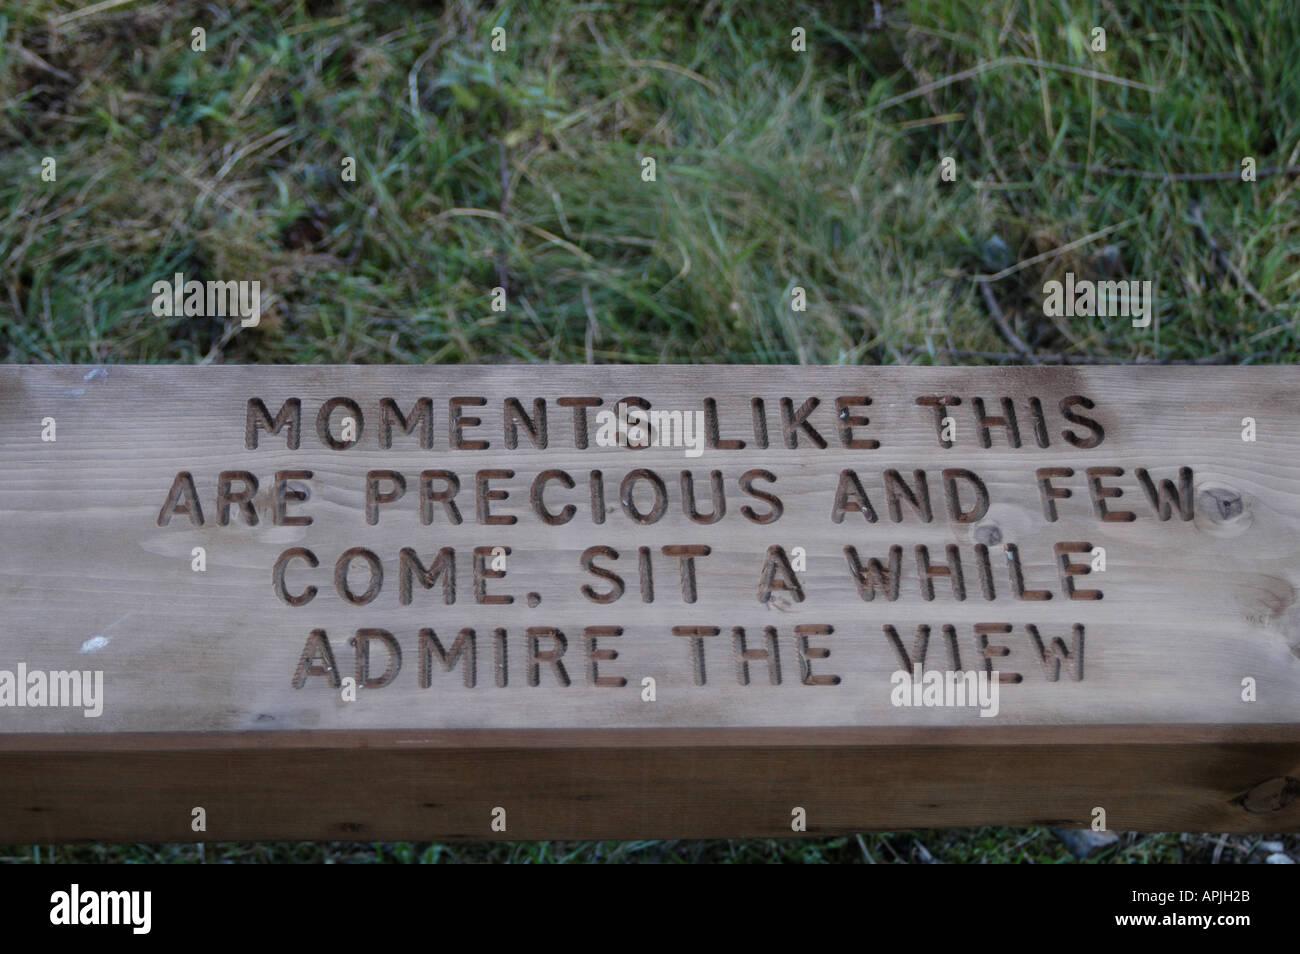 Inscription on seat in woodland walk - Stock Image